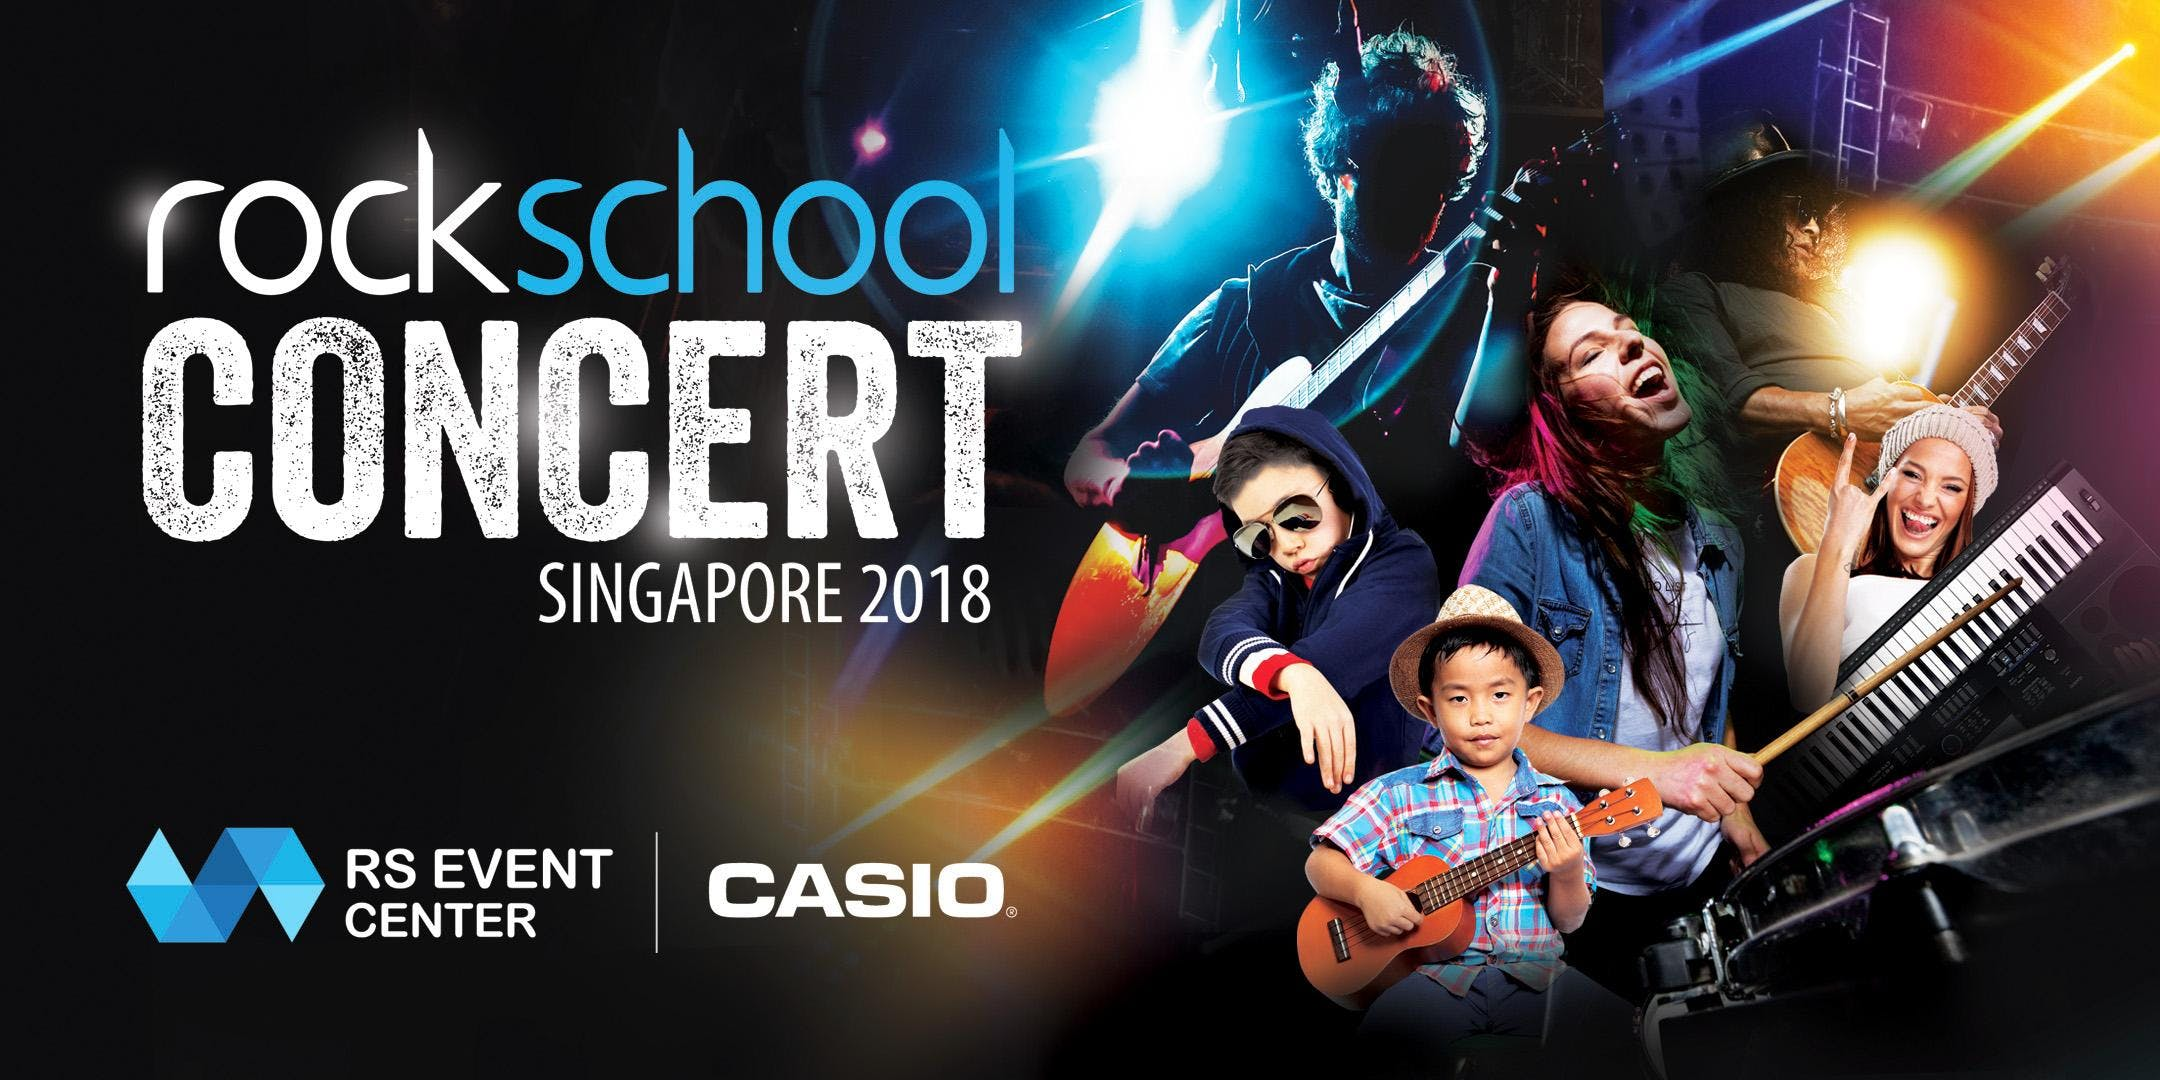 Rockschool Concert Singapore 2018